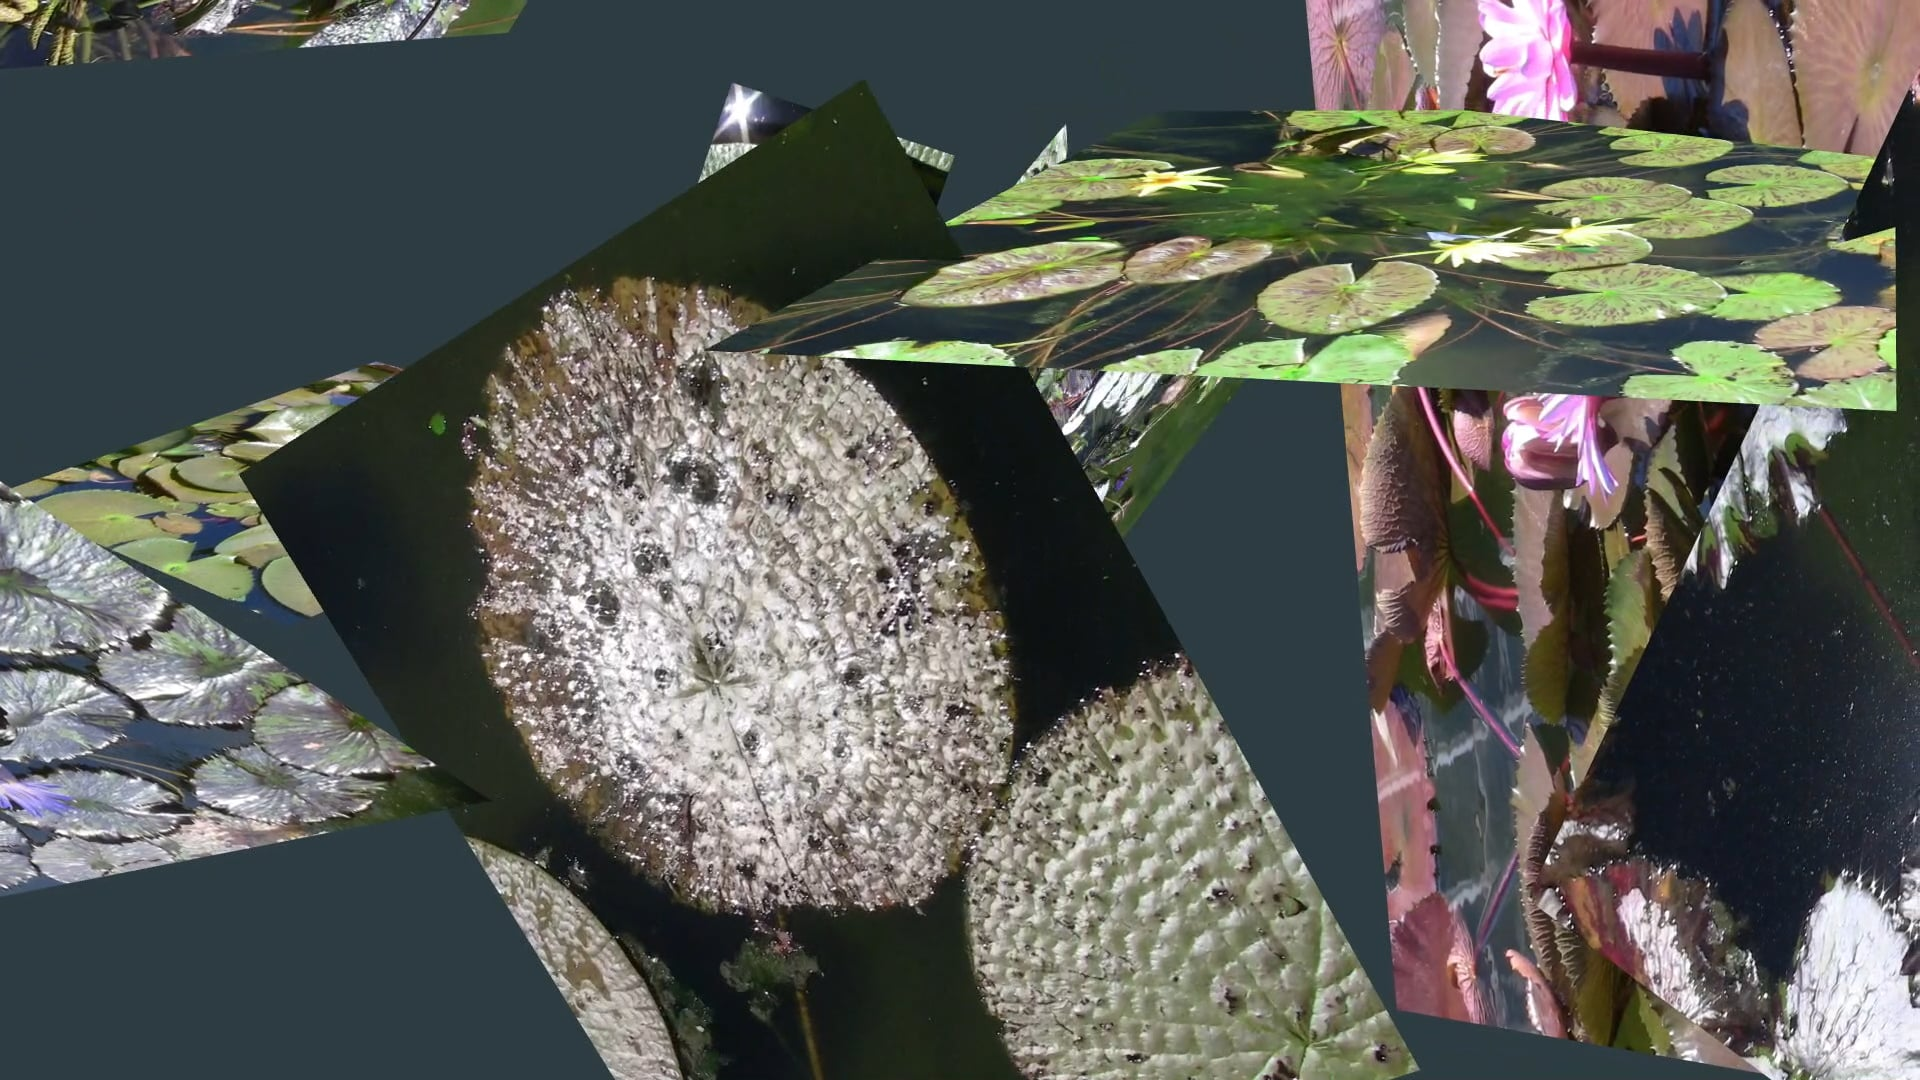 Anamorphic Fluid: Kyoto Water Lilies